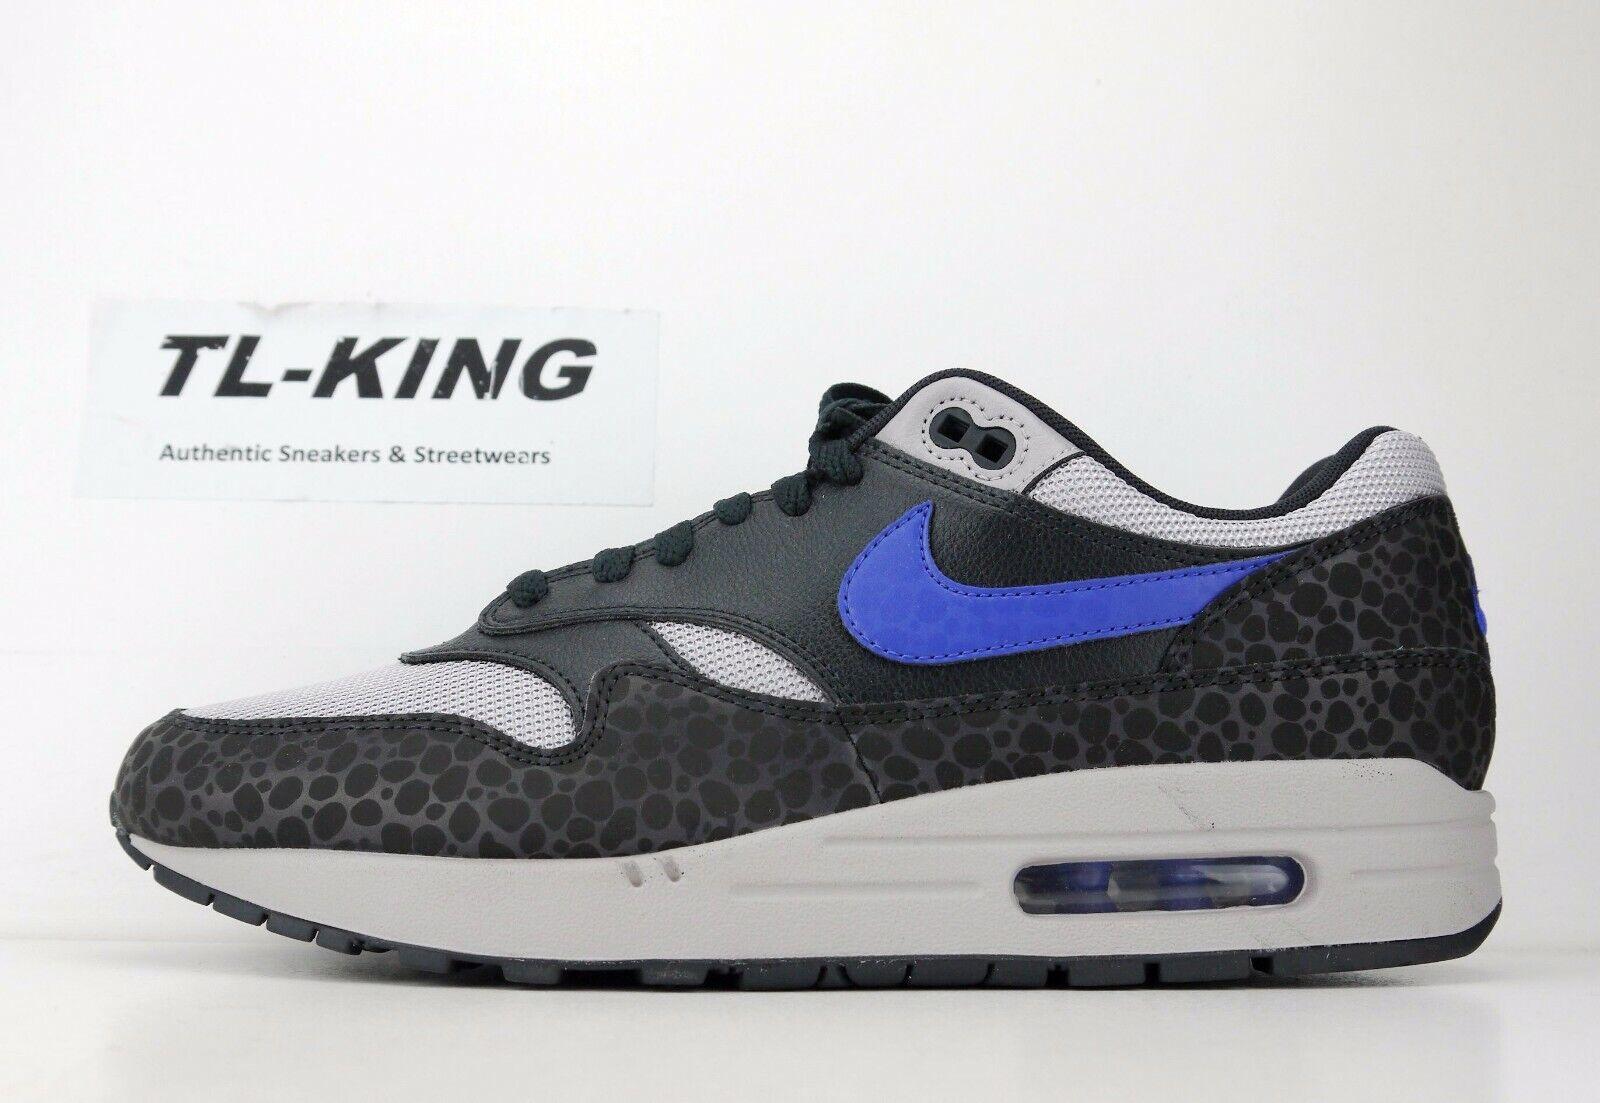 Nike Air max 1 SE Reflective 3M Safari Off black Hyper bluee BQ6521 001 AC